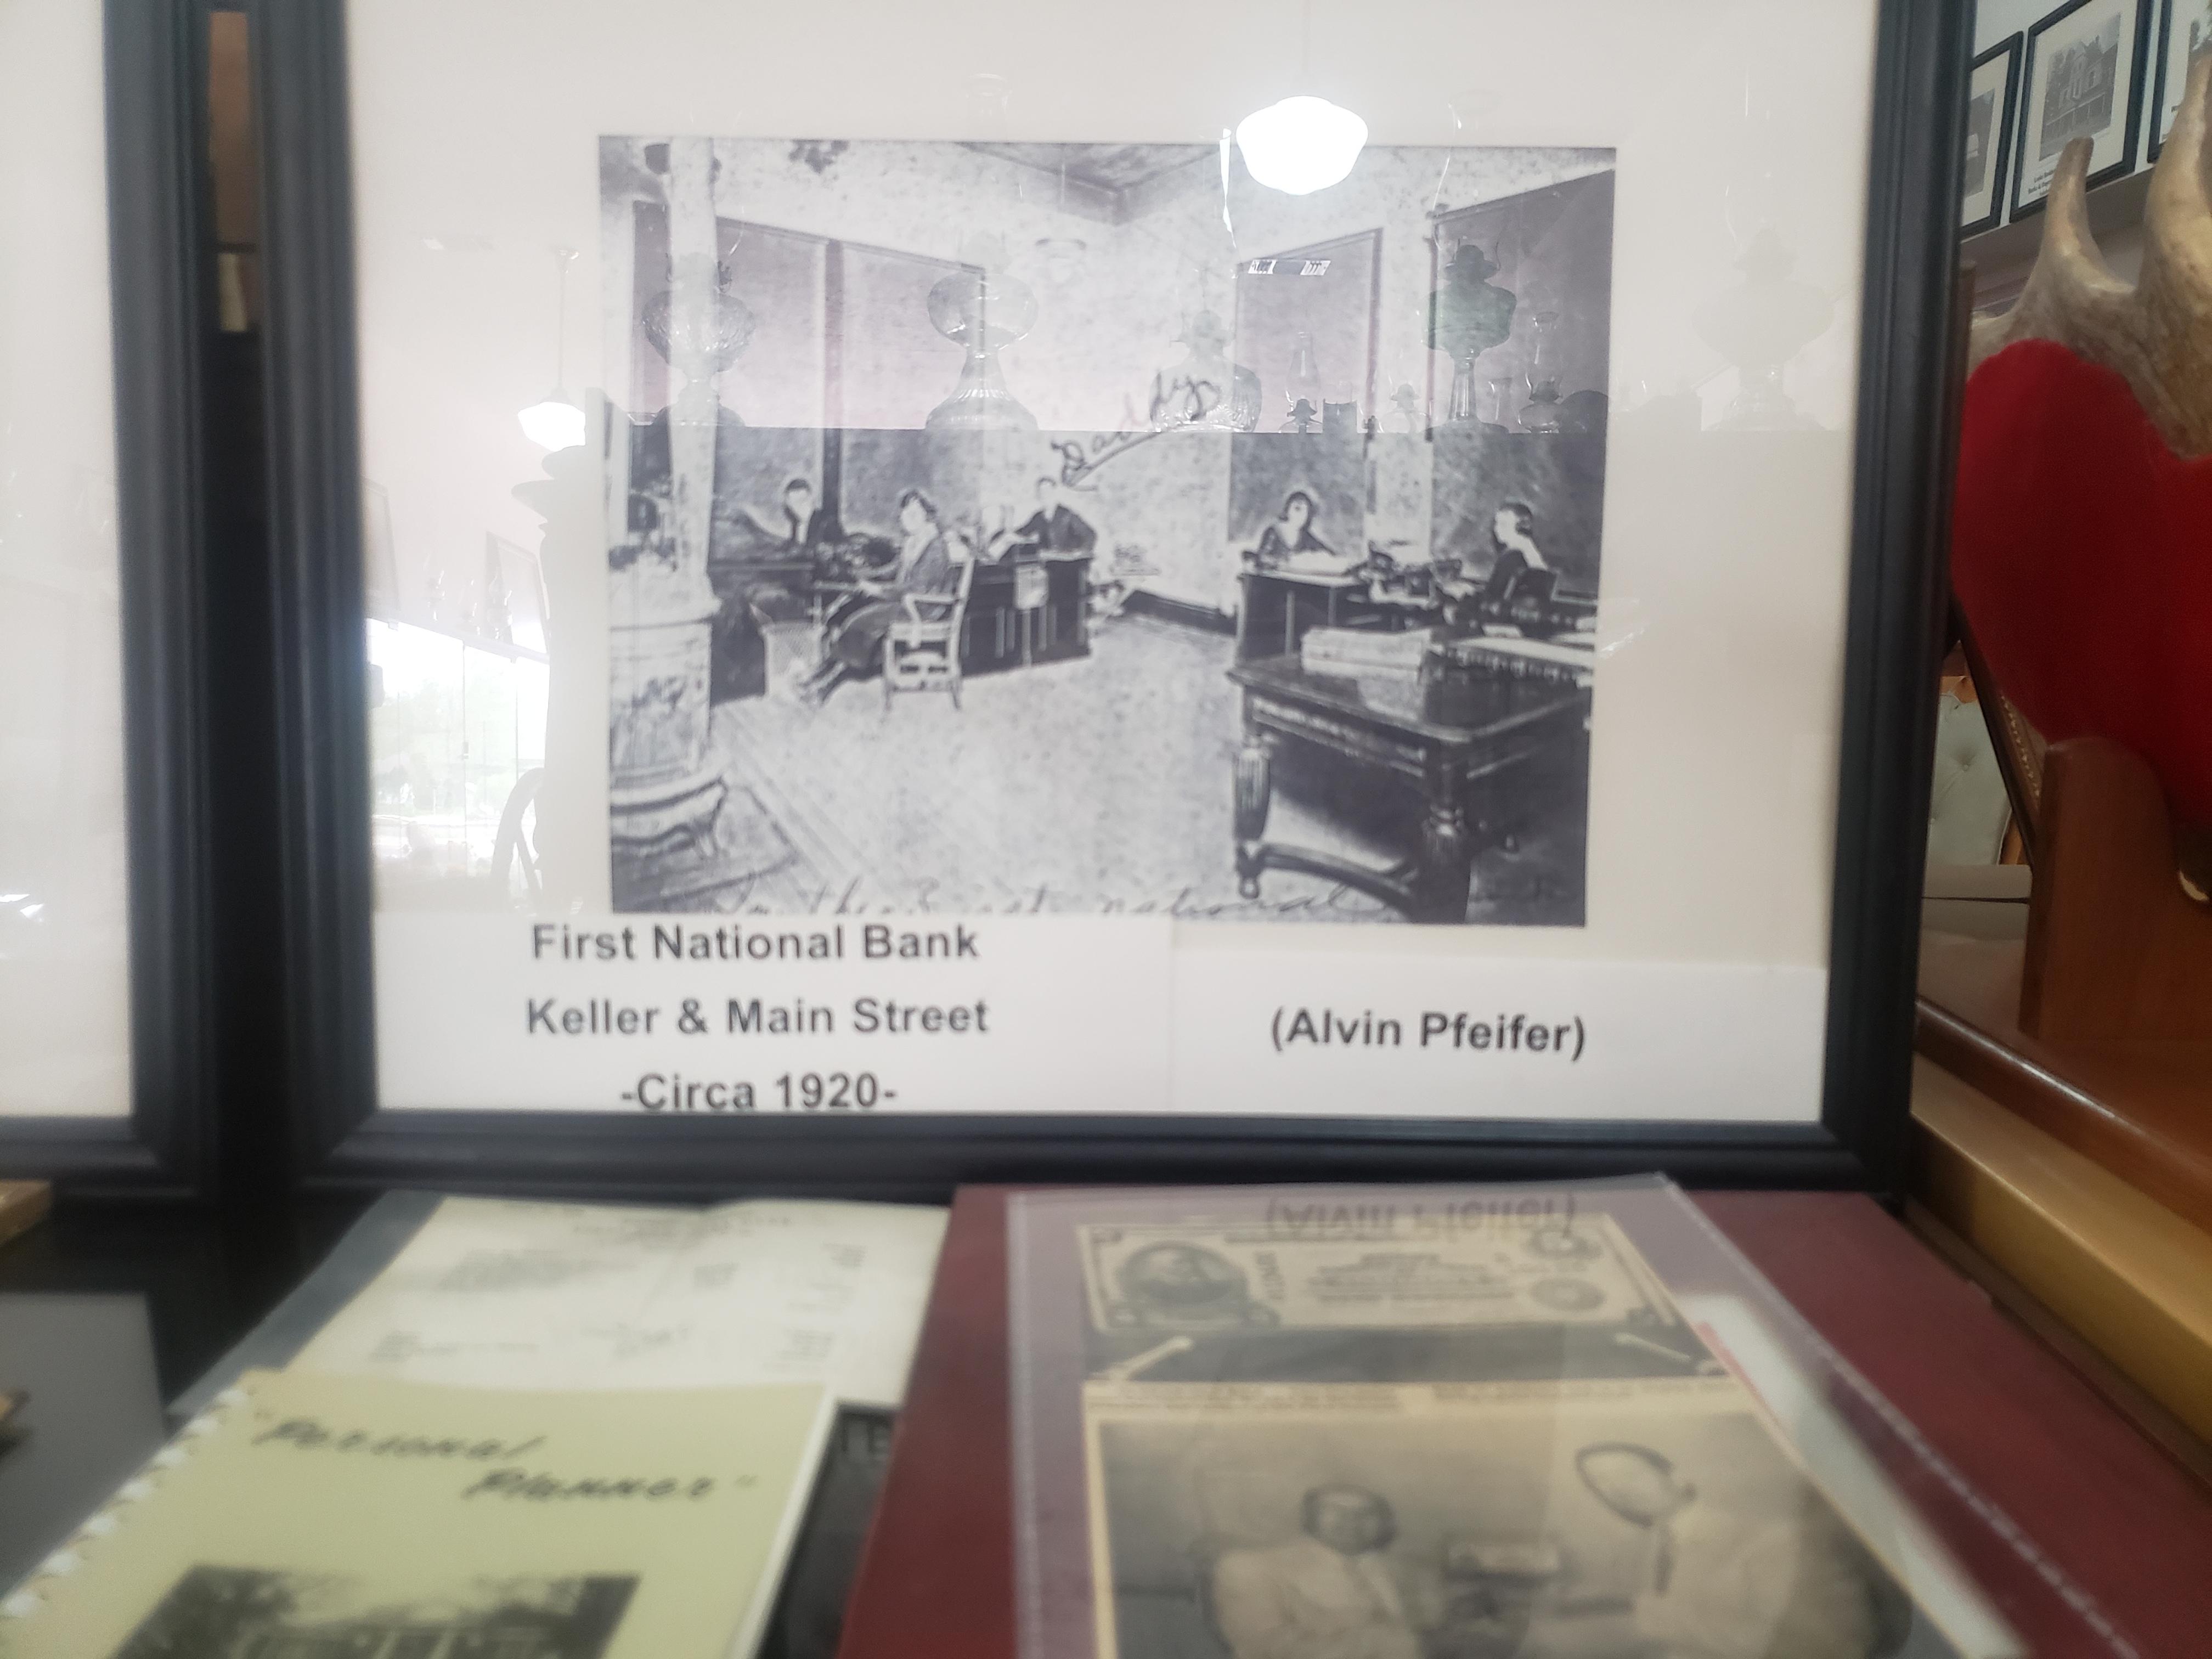 First National Bank Keller & Main Street. circa 1920.